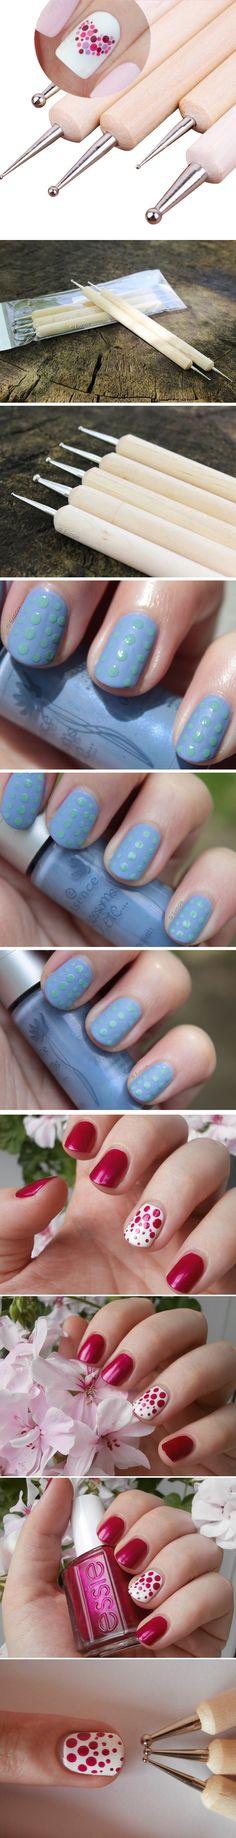 5Pcs 2 Way Wooden Dotting Pen Marbleizing Tool Nail Art Dot Dotting Tools #14198 - nail art, nail designs, nail art ideas, nail art diy, simple nail art, simple nail designs, cool nail art, cool nail designs, arte de uñas, diseño de uñas, дизайн ногтей, м